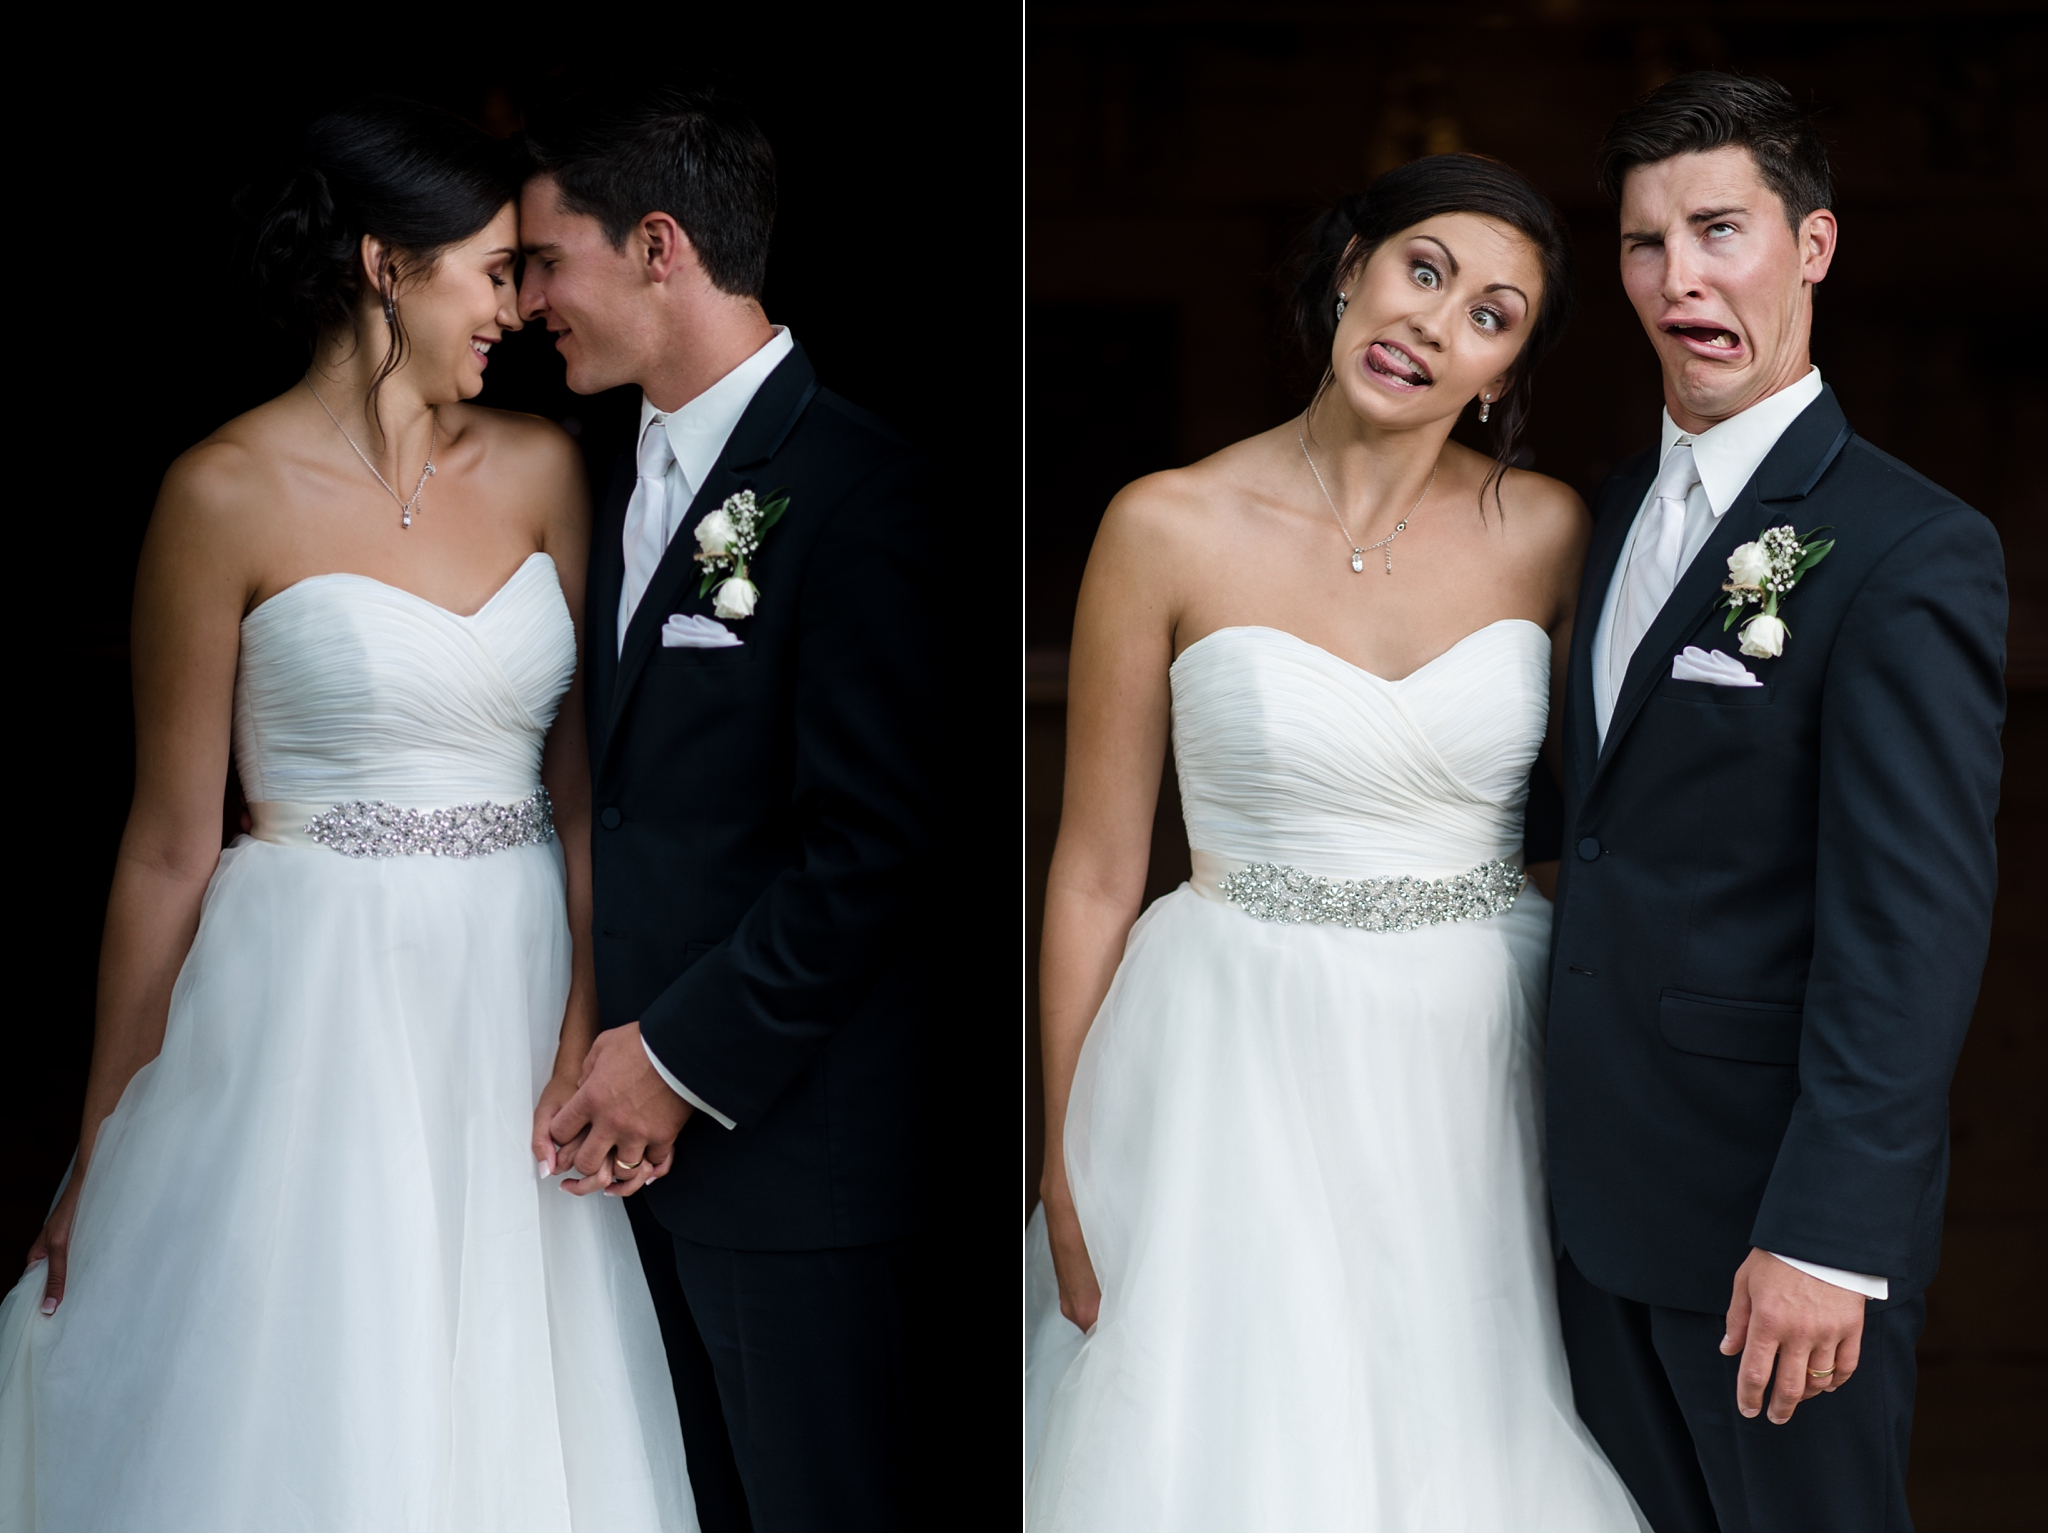 kaihla_tonai_intimate_wedding_elopement_photographer_0110